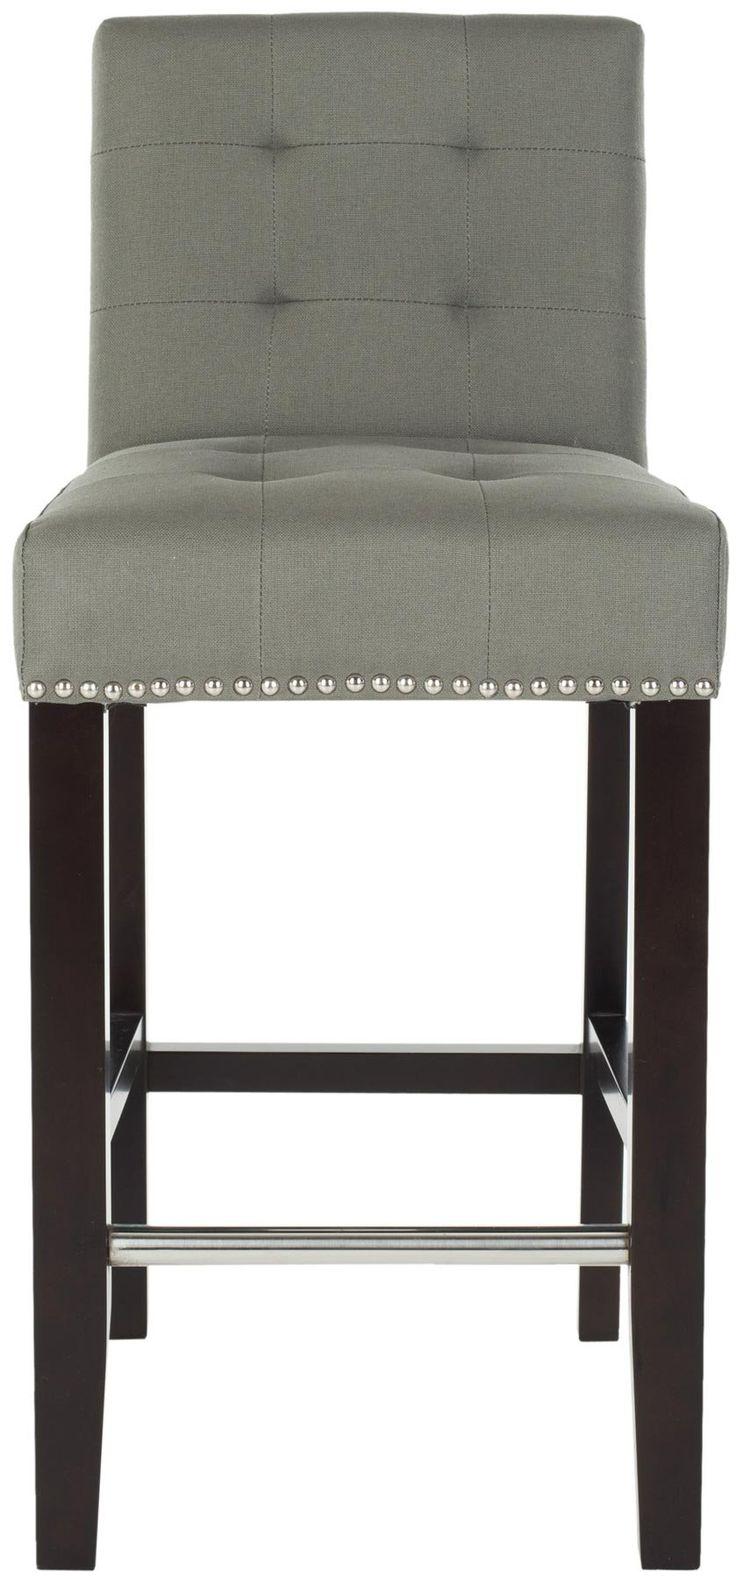 43 best kitchen stools images on pinterest